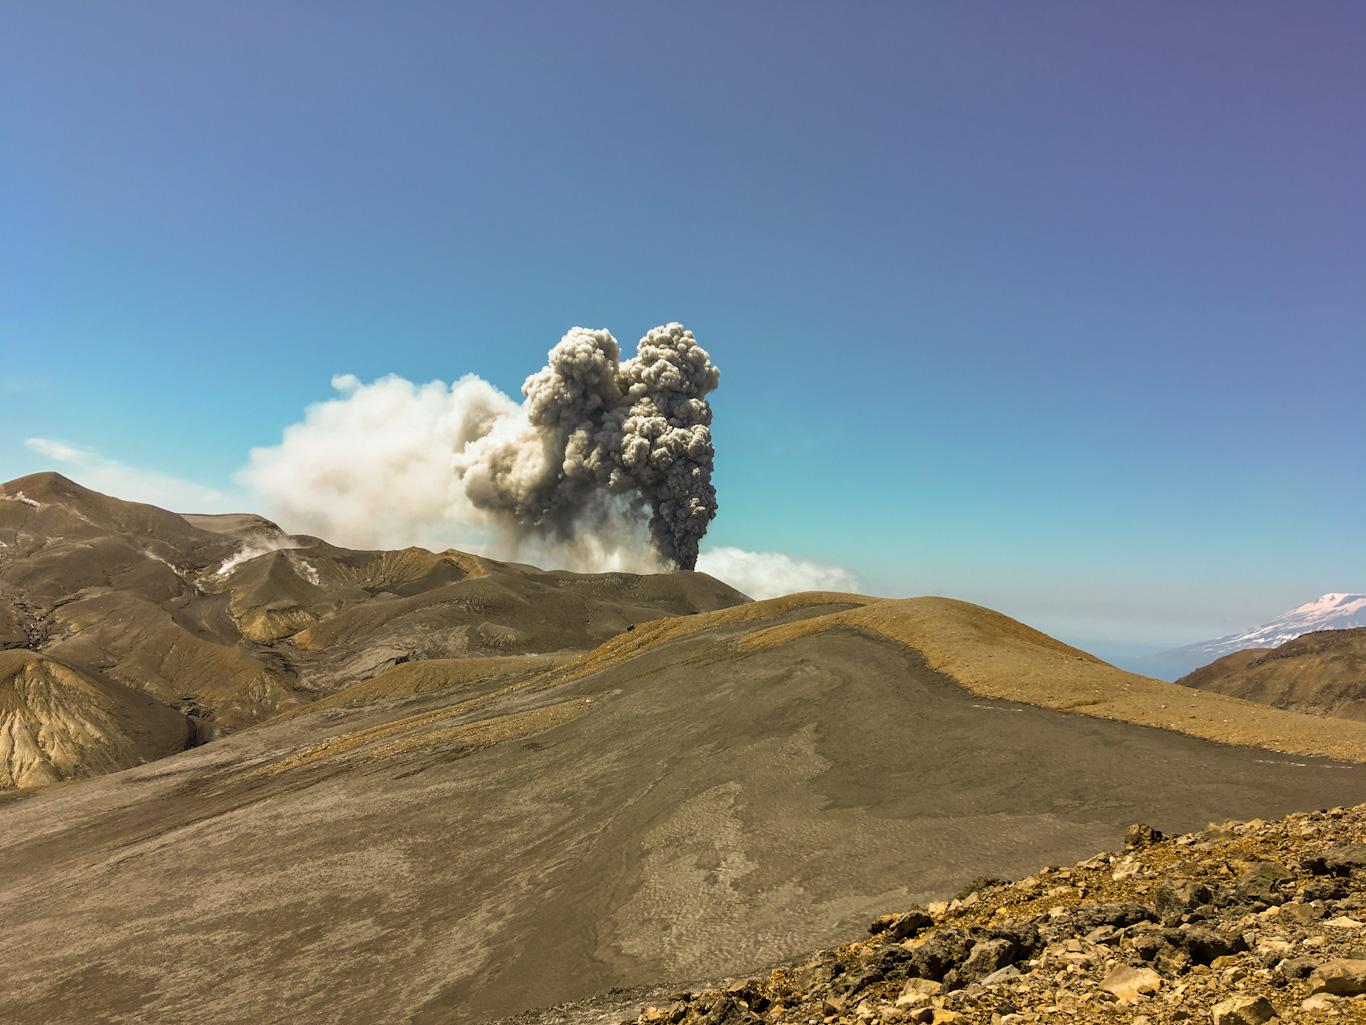 Парамушир, вулкан Эбеко